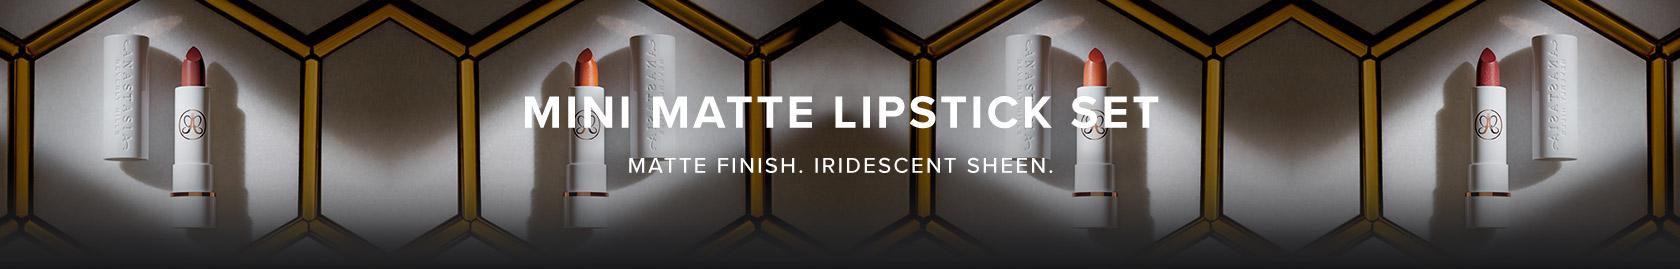 Mini matte lipstick set - matte finish, iridescent sheen